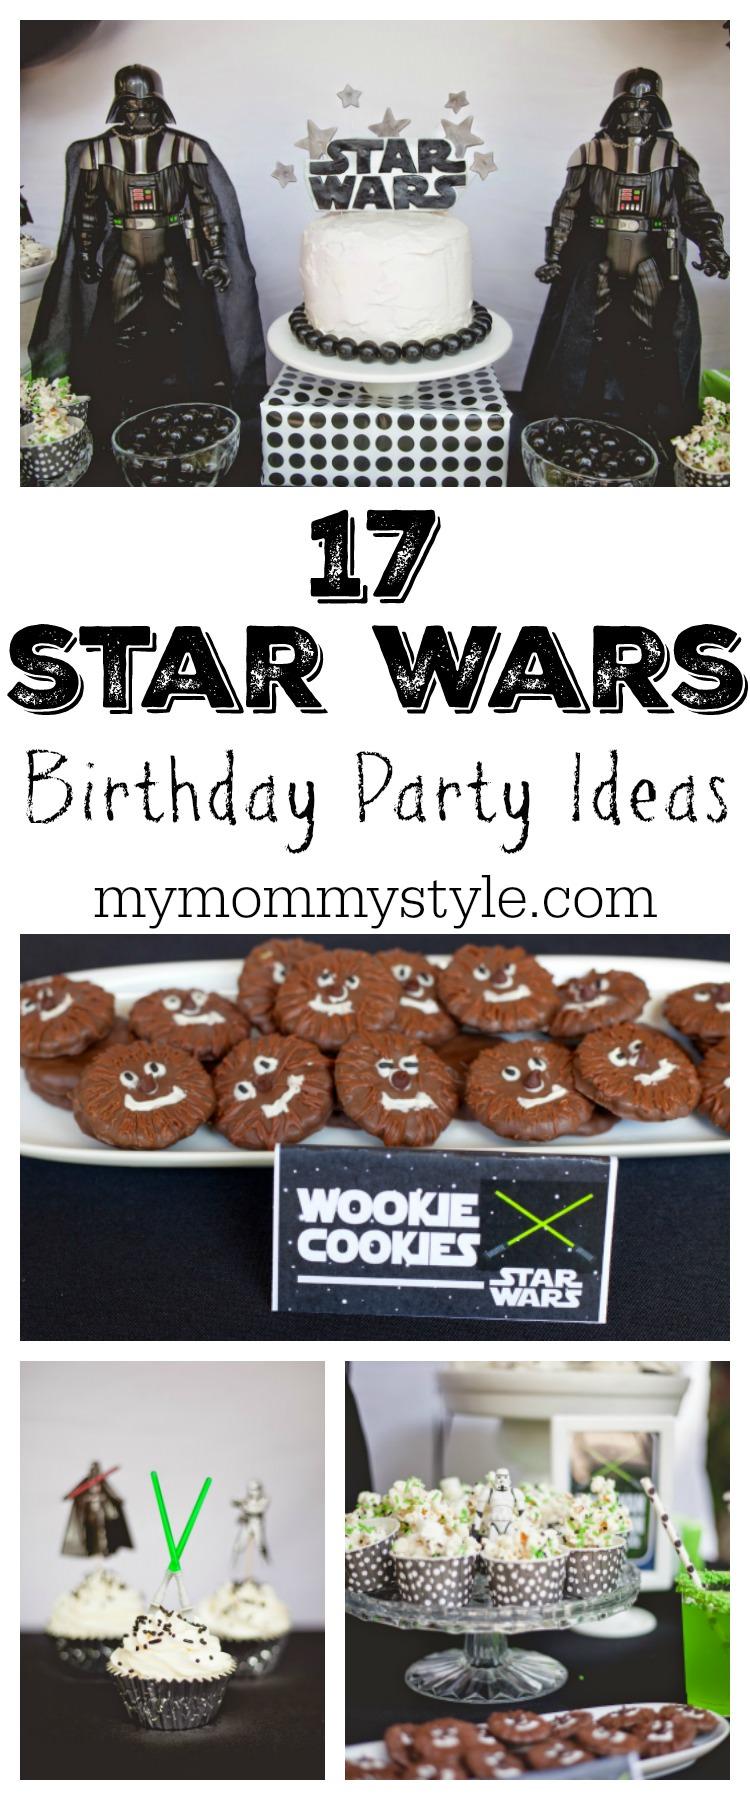 Star Wars Birthday Party Ideas! via @mymommystyle